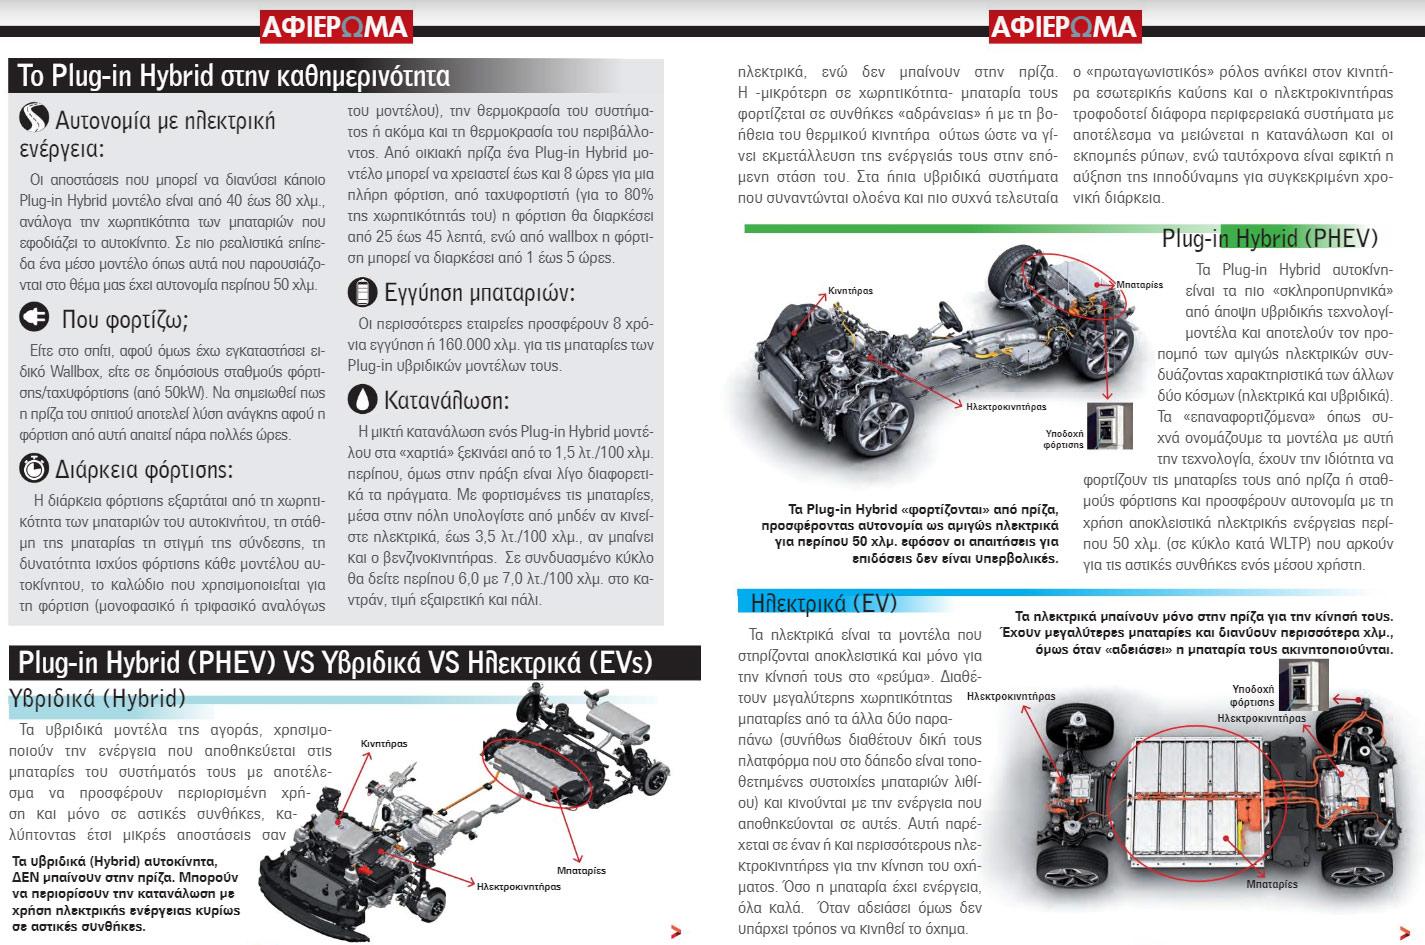 aytokinhta-plug-in-hybrid-vs-ybridika-vs-hlektrika-autokinita-diafores-aytokinhton-